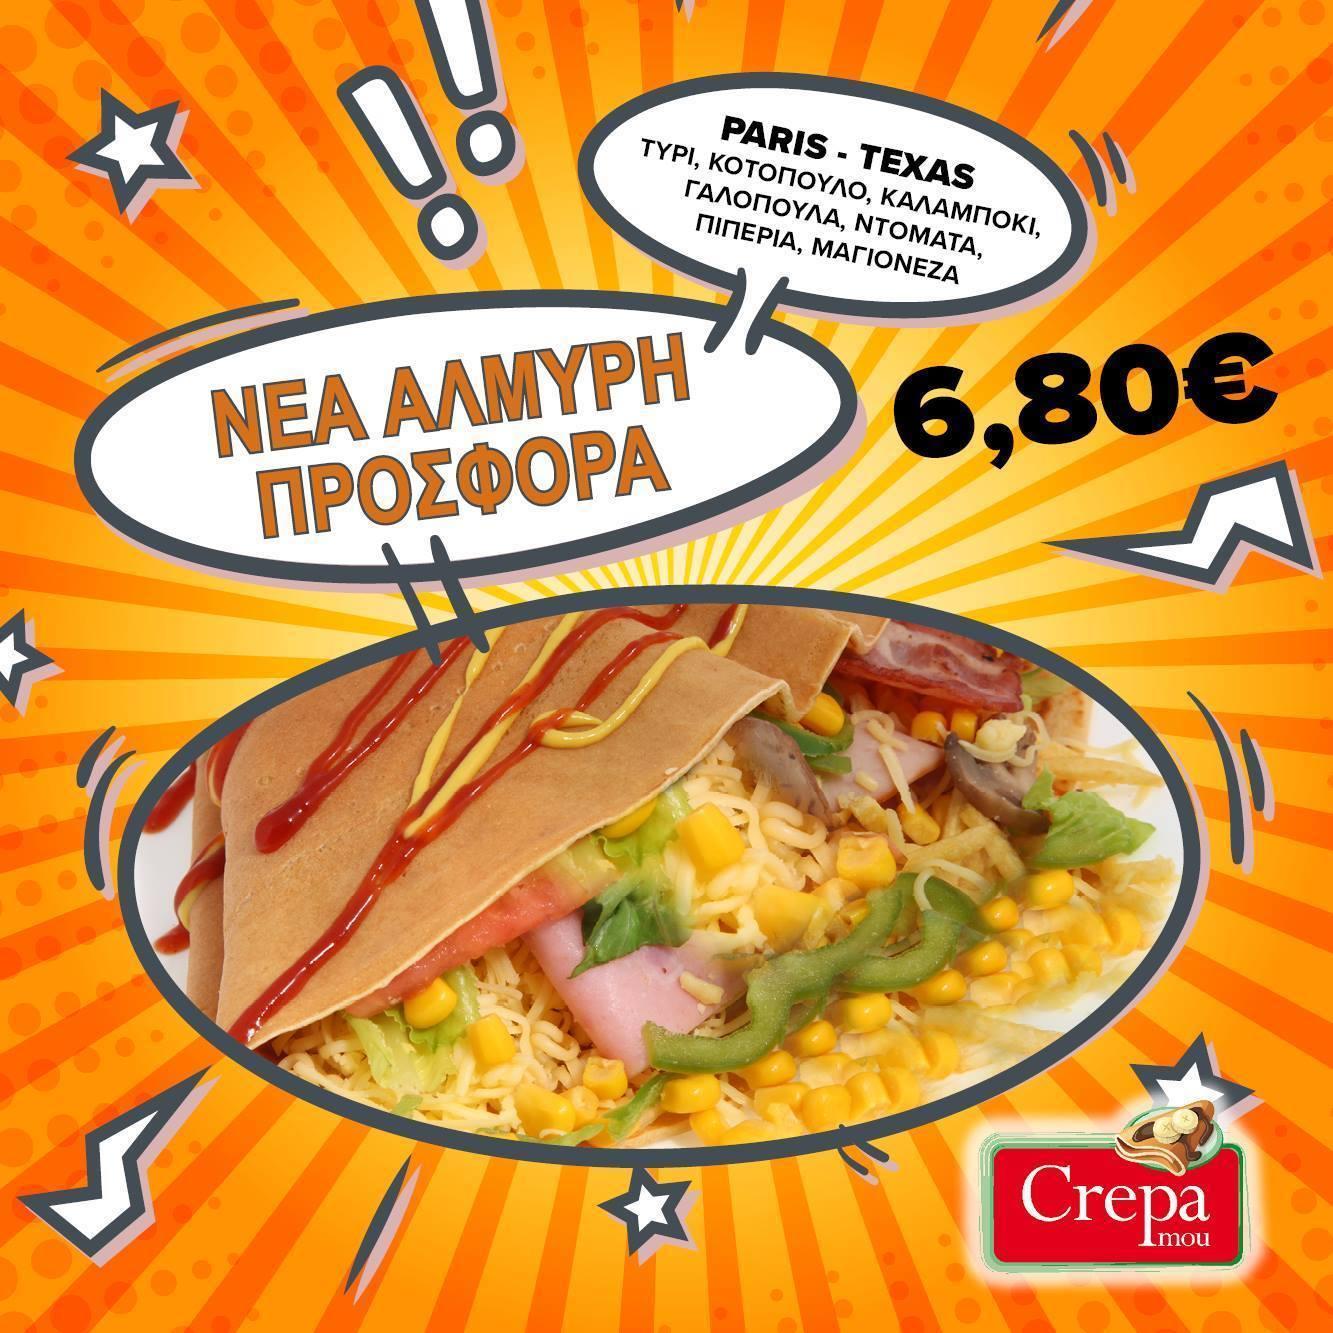 crepamou monday offer 200217